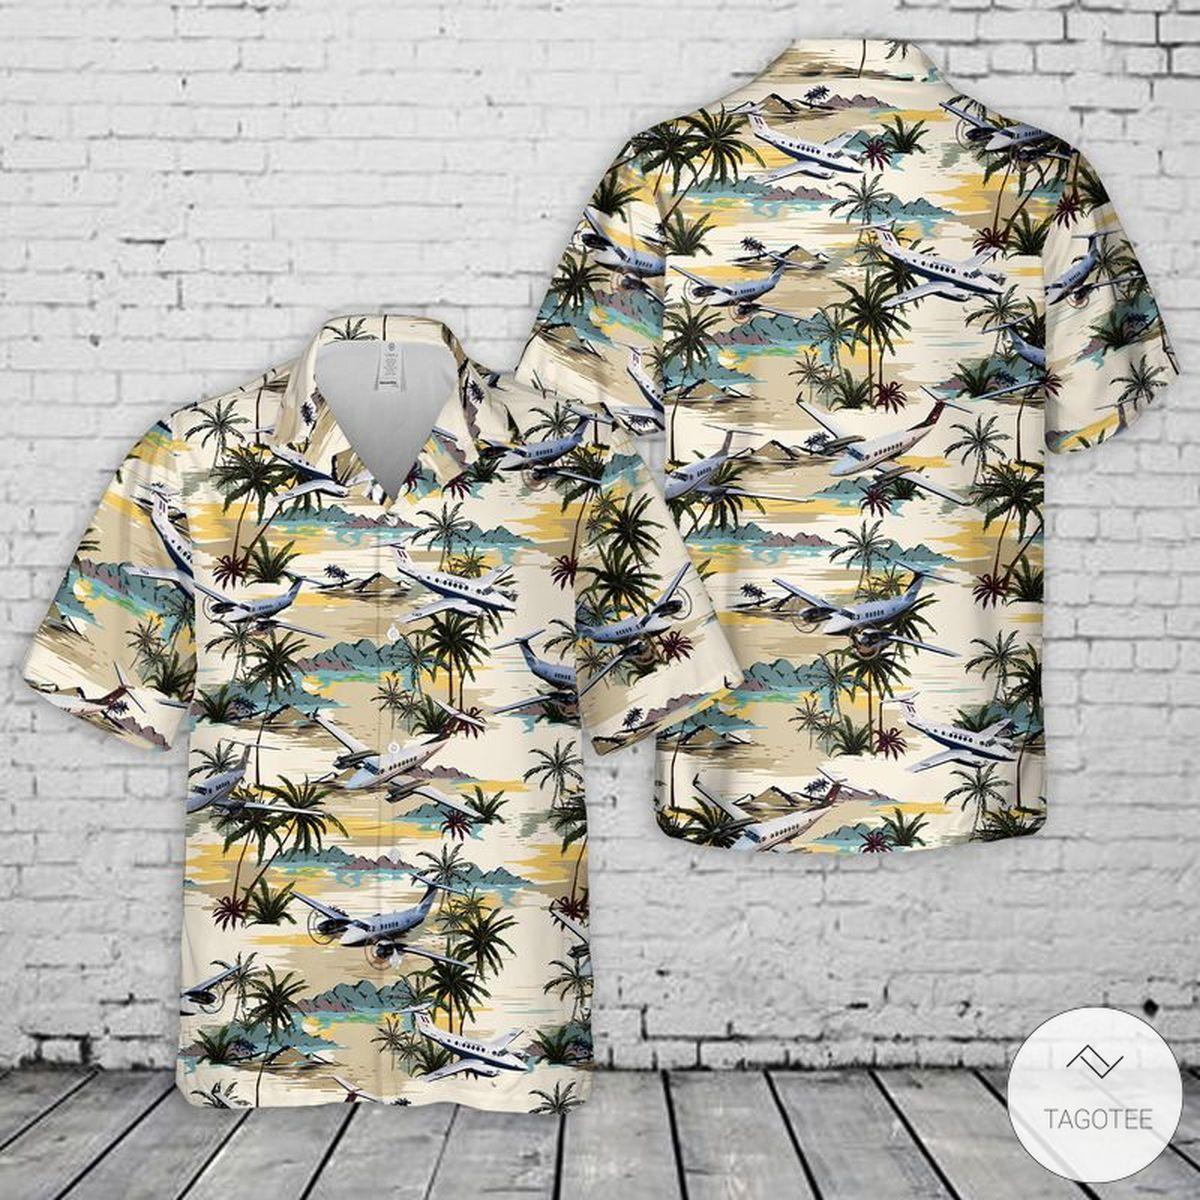 Beechcraft Super King Air Hawaiian Shirt, Beach Shorts